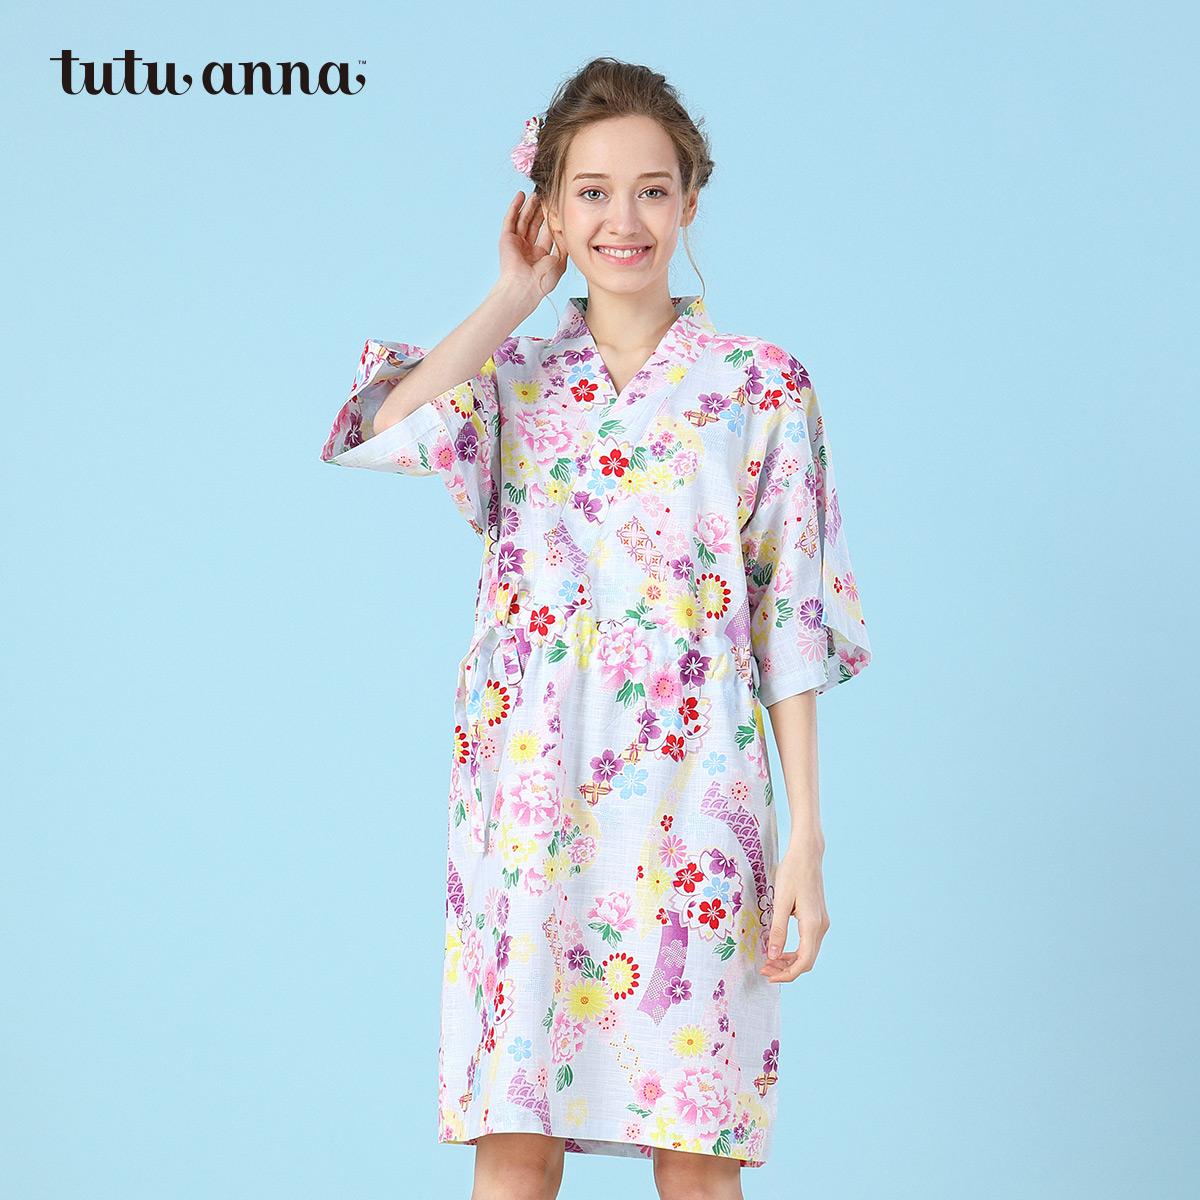 tutuanna2018春夏新品睡裙女 和风甚平 牡丹花图案棉质连衣裙和服